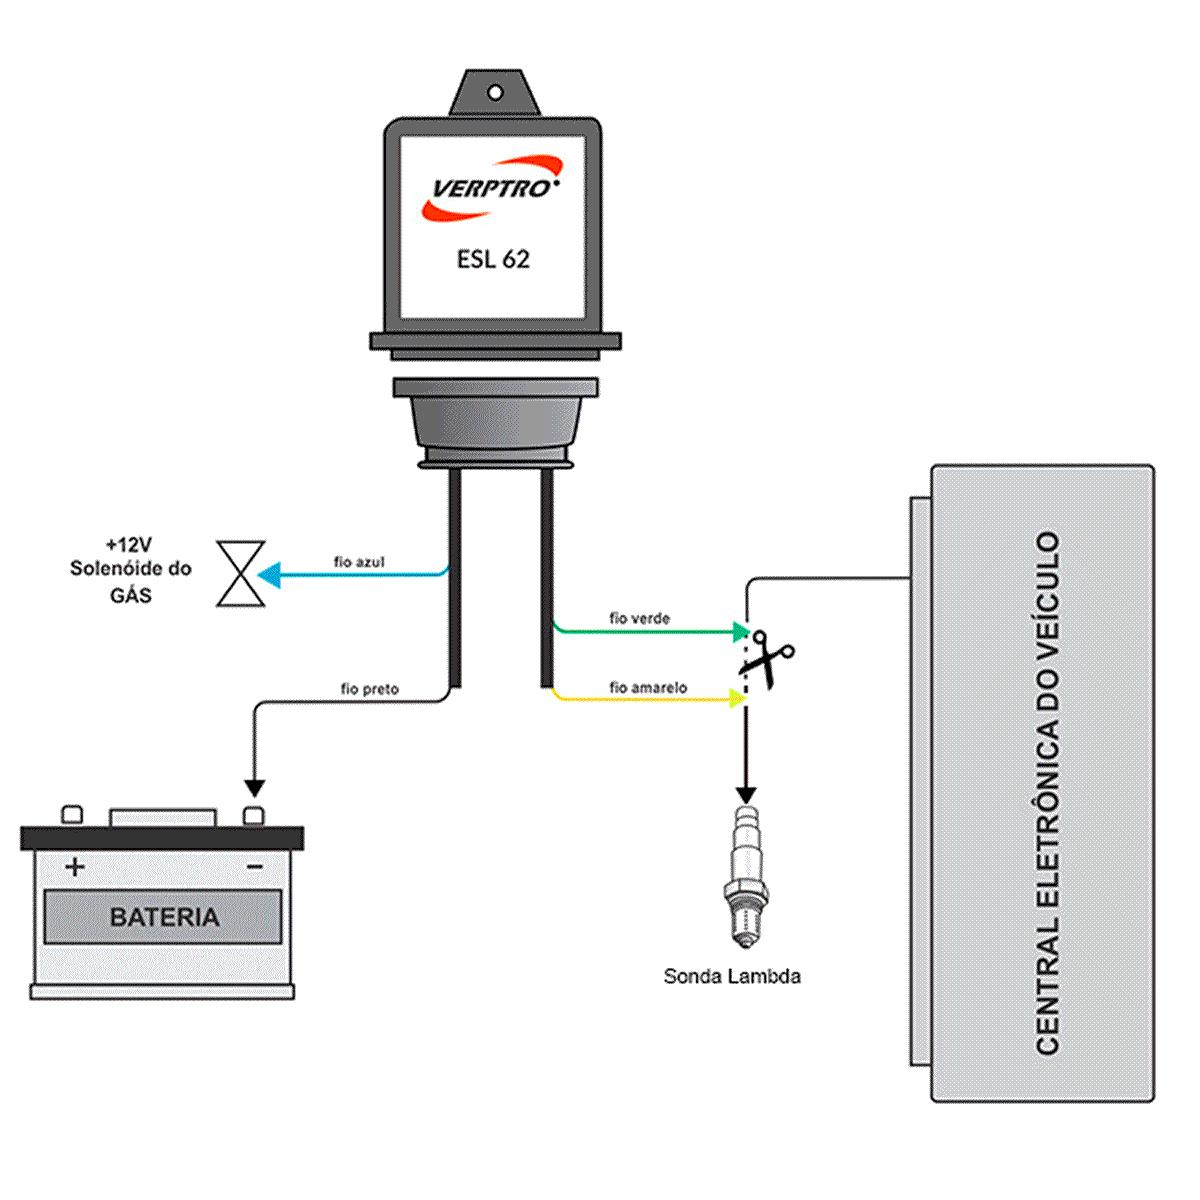 Simulador de Sonda Fixa Gasolina ESL62 G Verptro